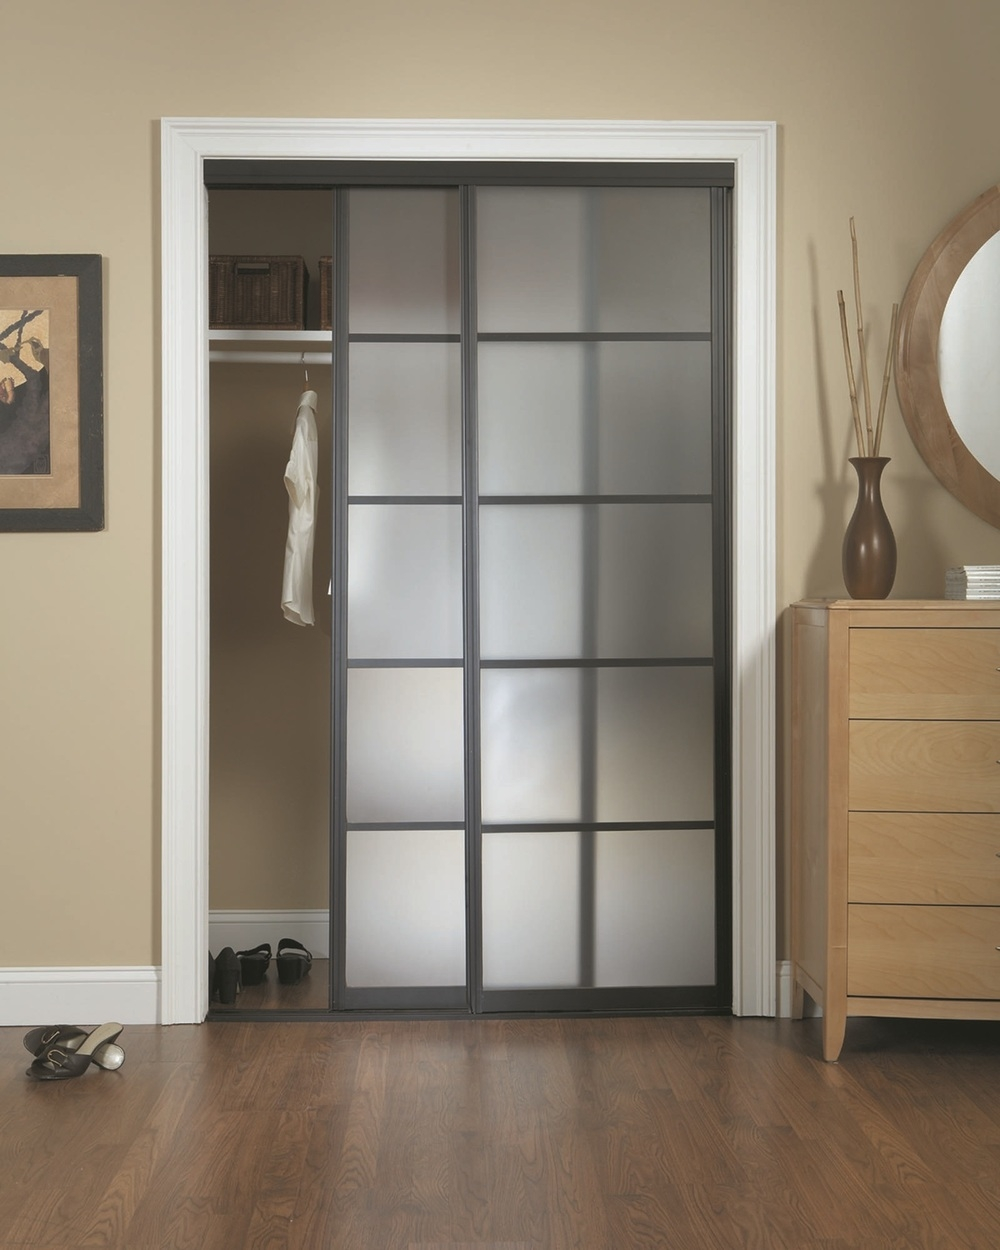 Custom Closets With Sliding DoorsCustom Closets With Sliding Doors